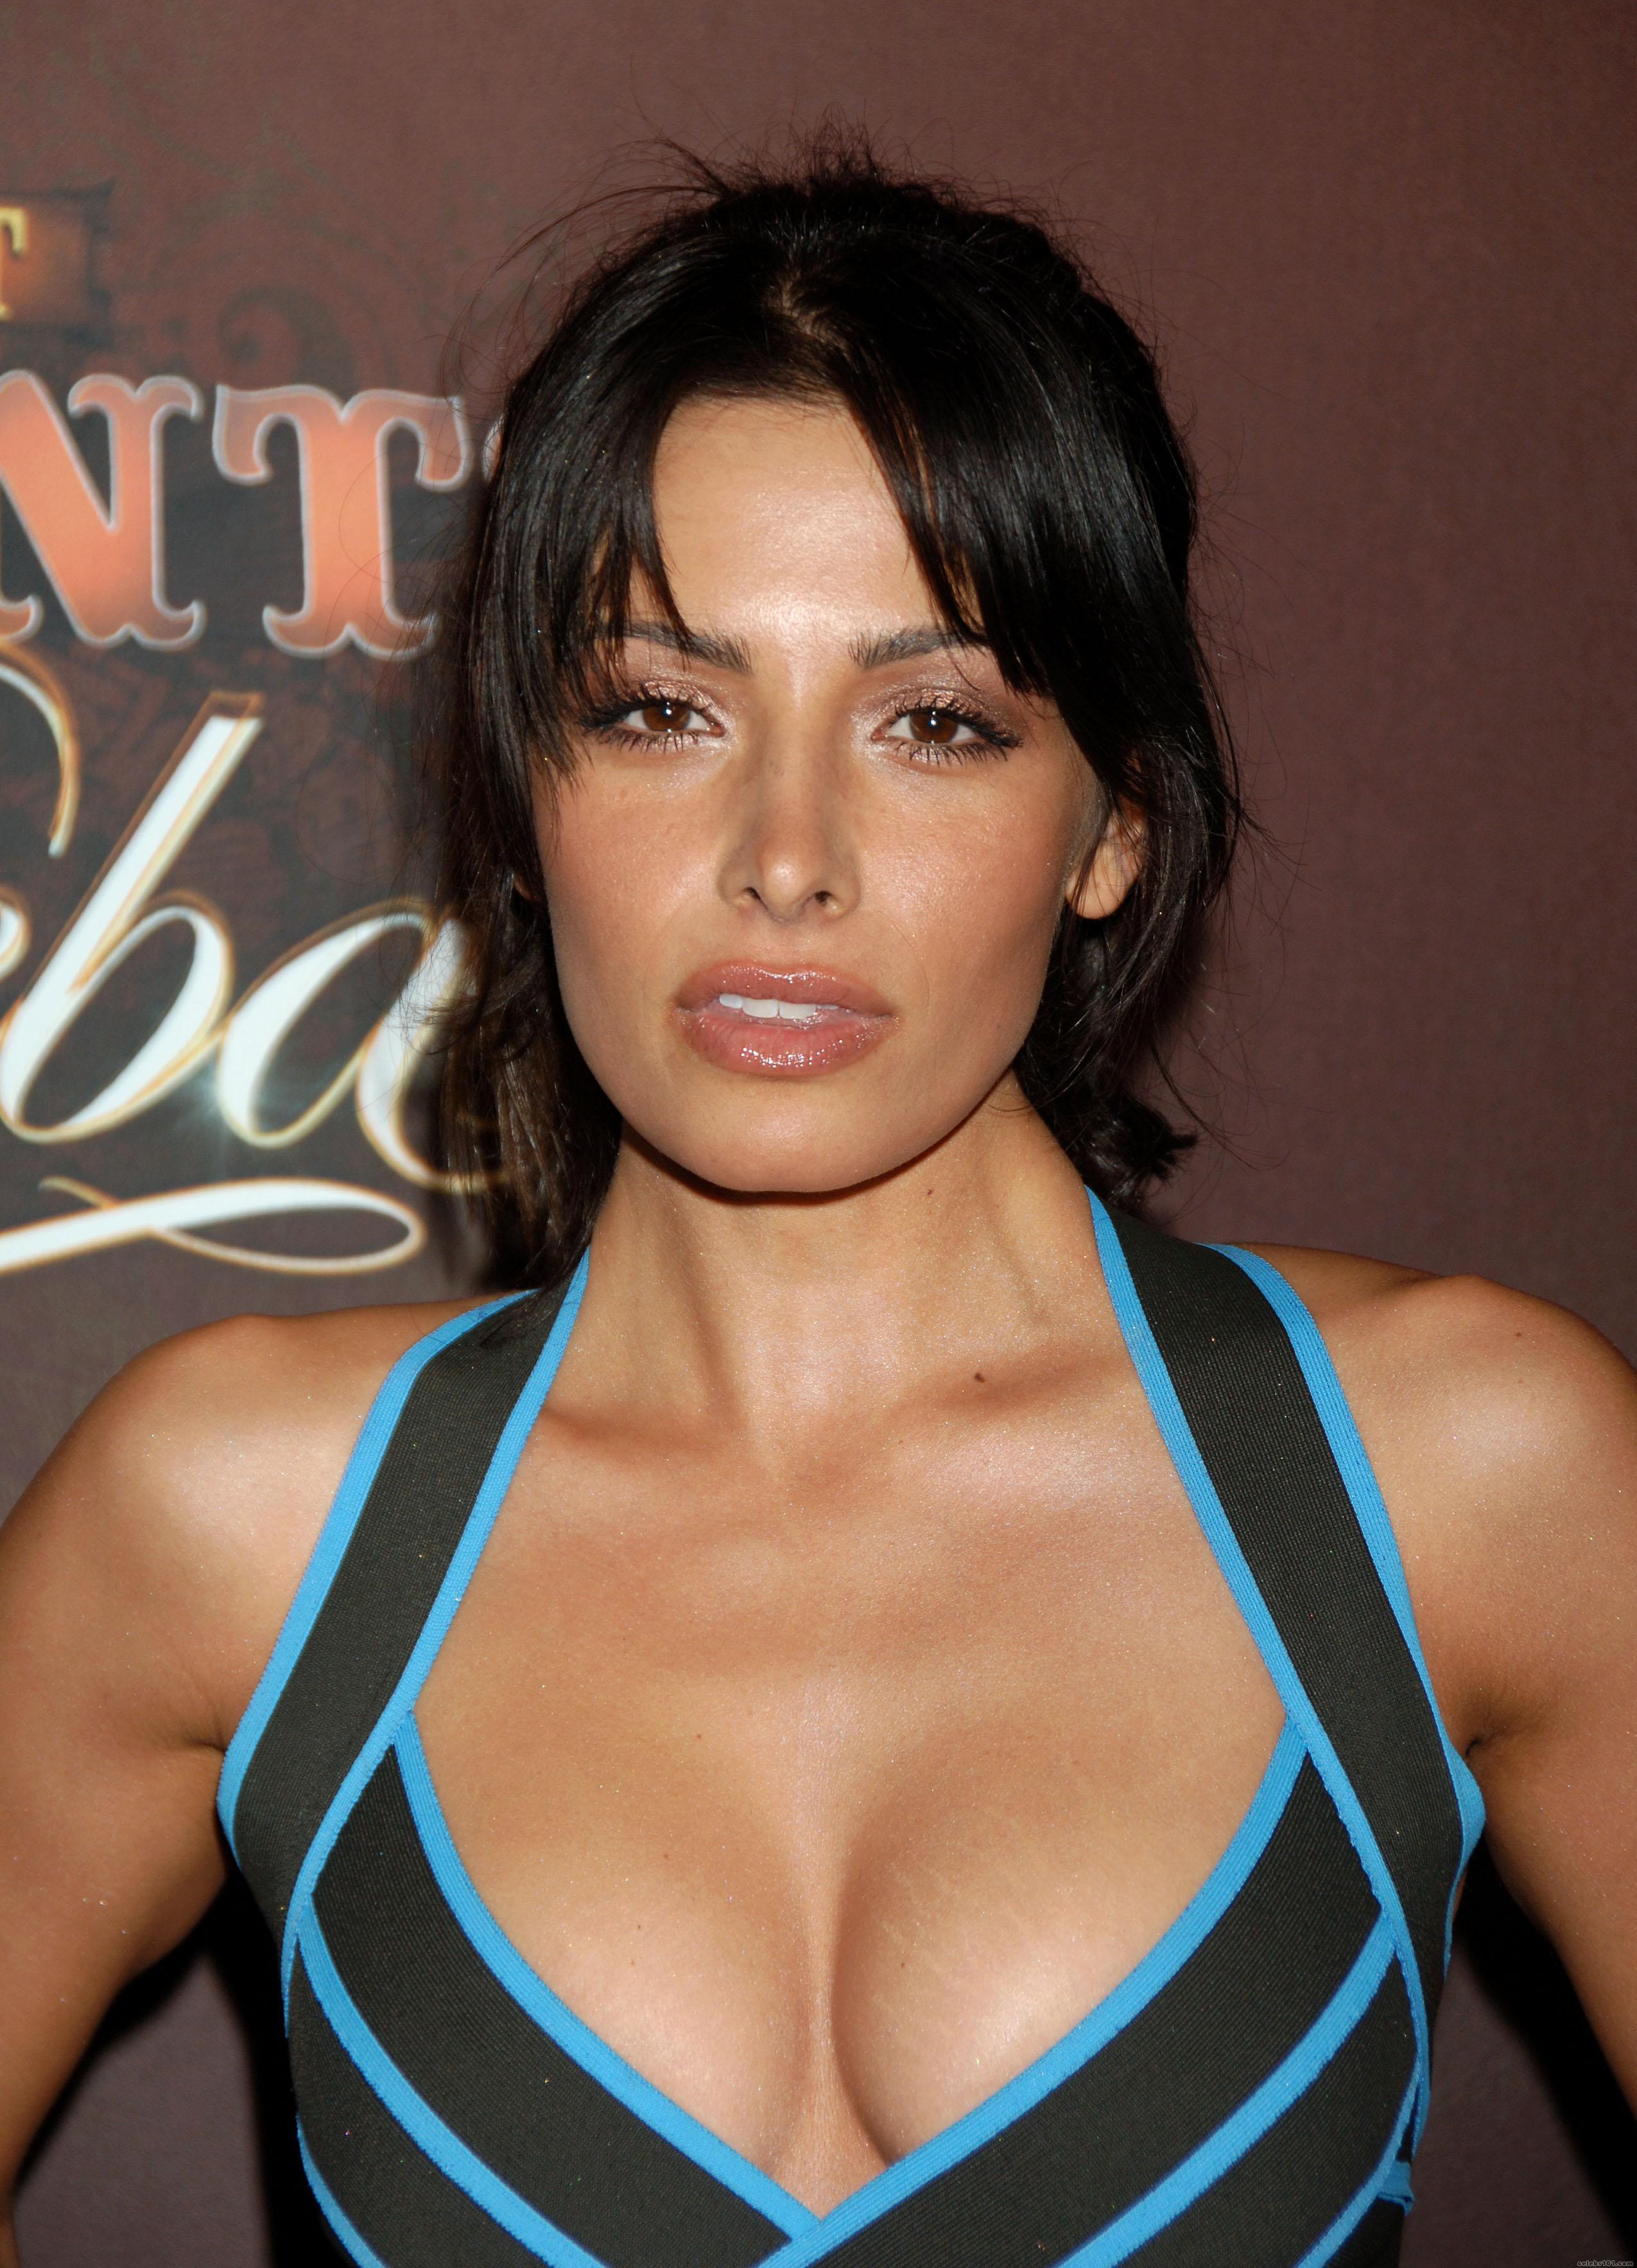 Poze rezolutie mare Sarah Shahi - Actor - Poza 13 din 137 - CineMagia ...